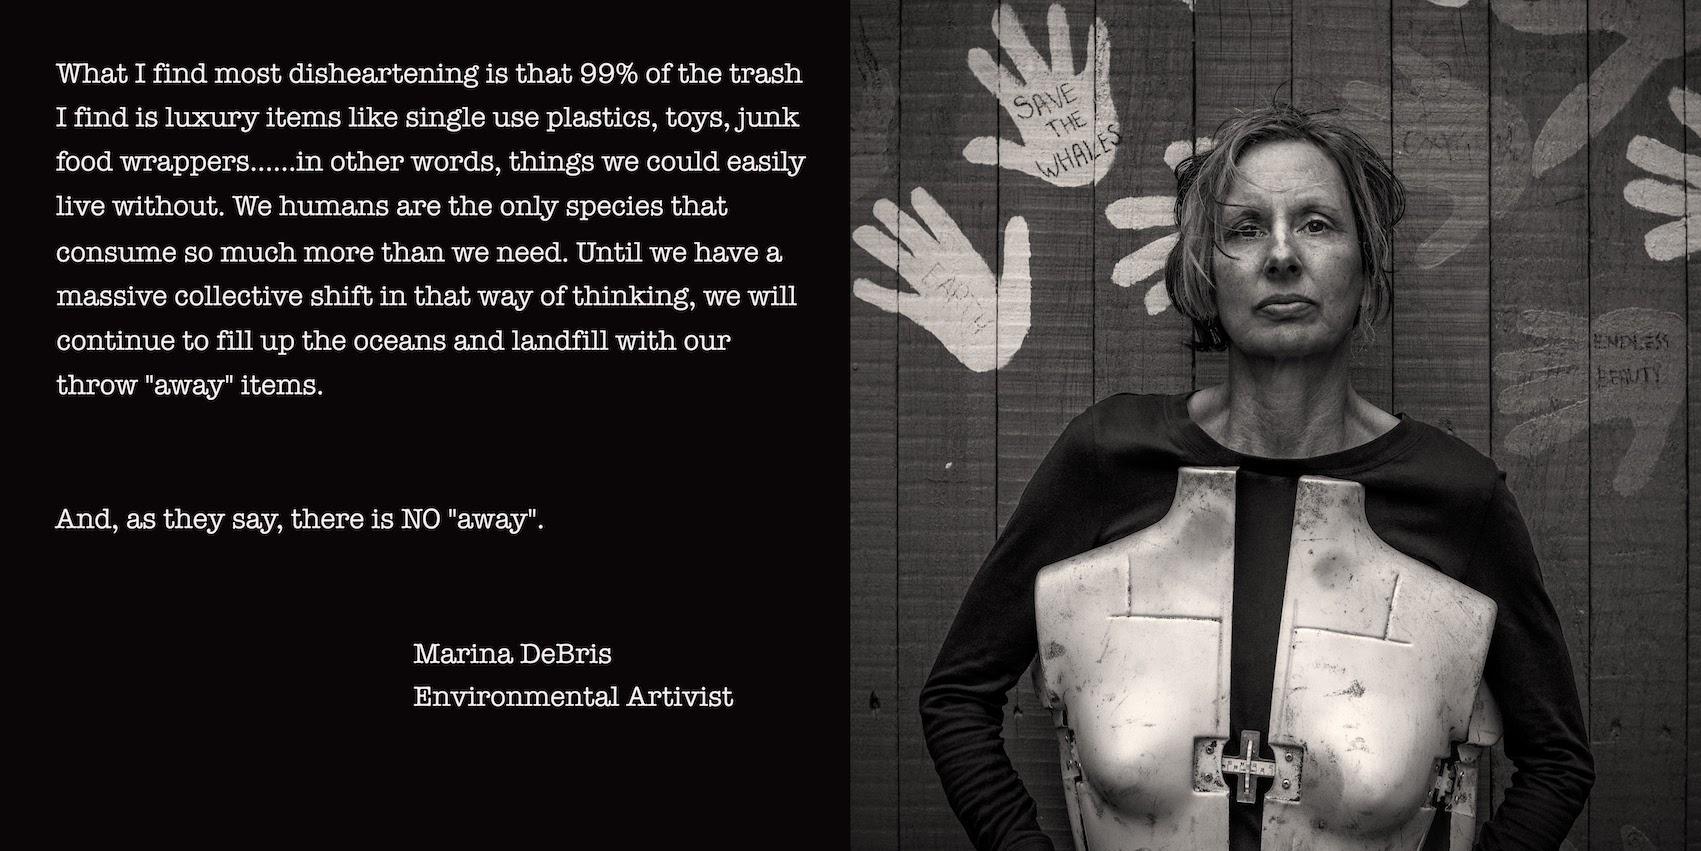 Marina DeBris on the Wardrobe Crisis Podcast